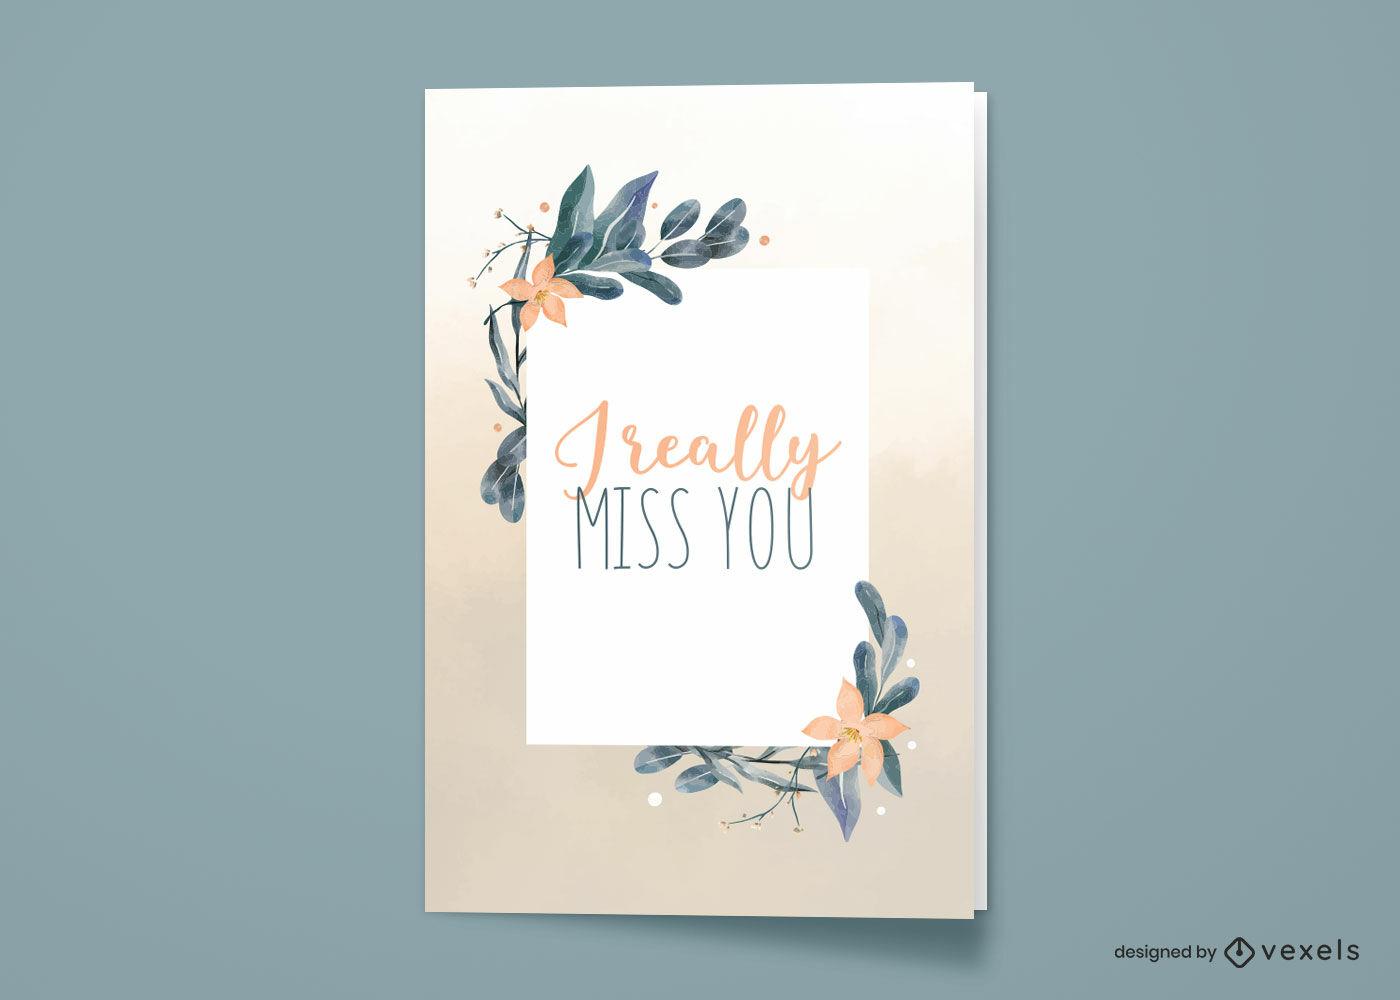 Diseño de tarjeta de felicitación de naturaleza acuarela